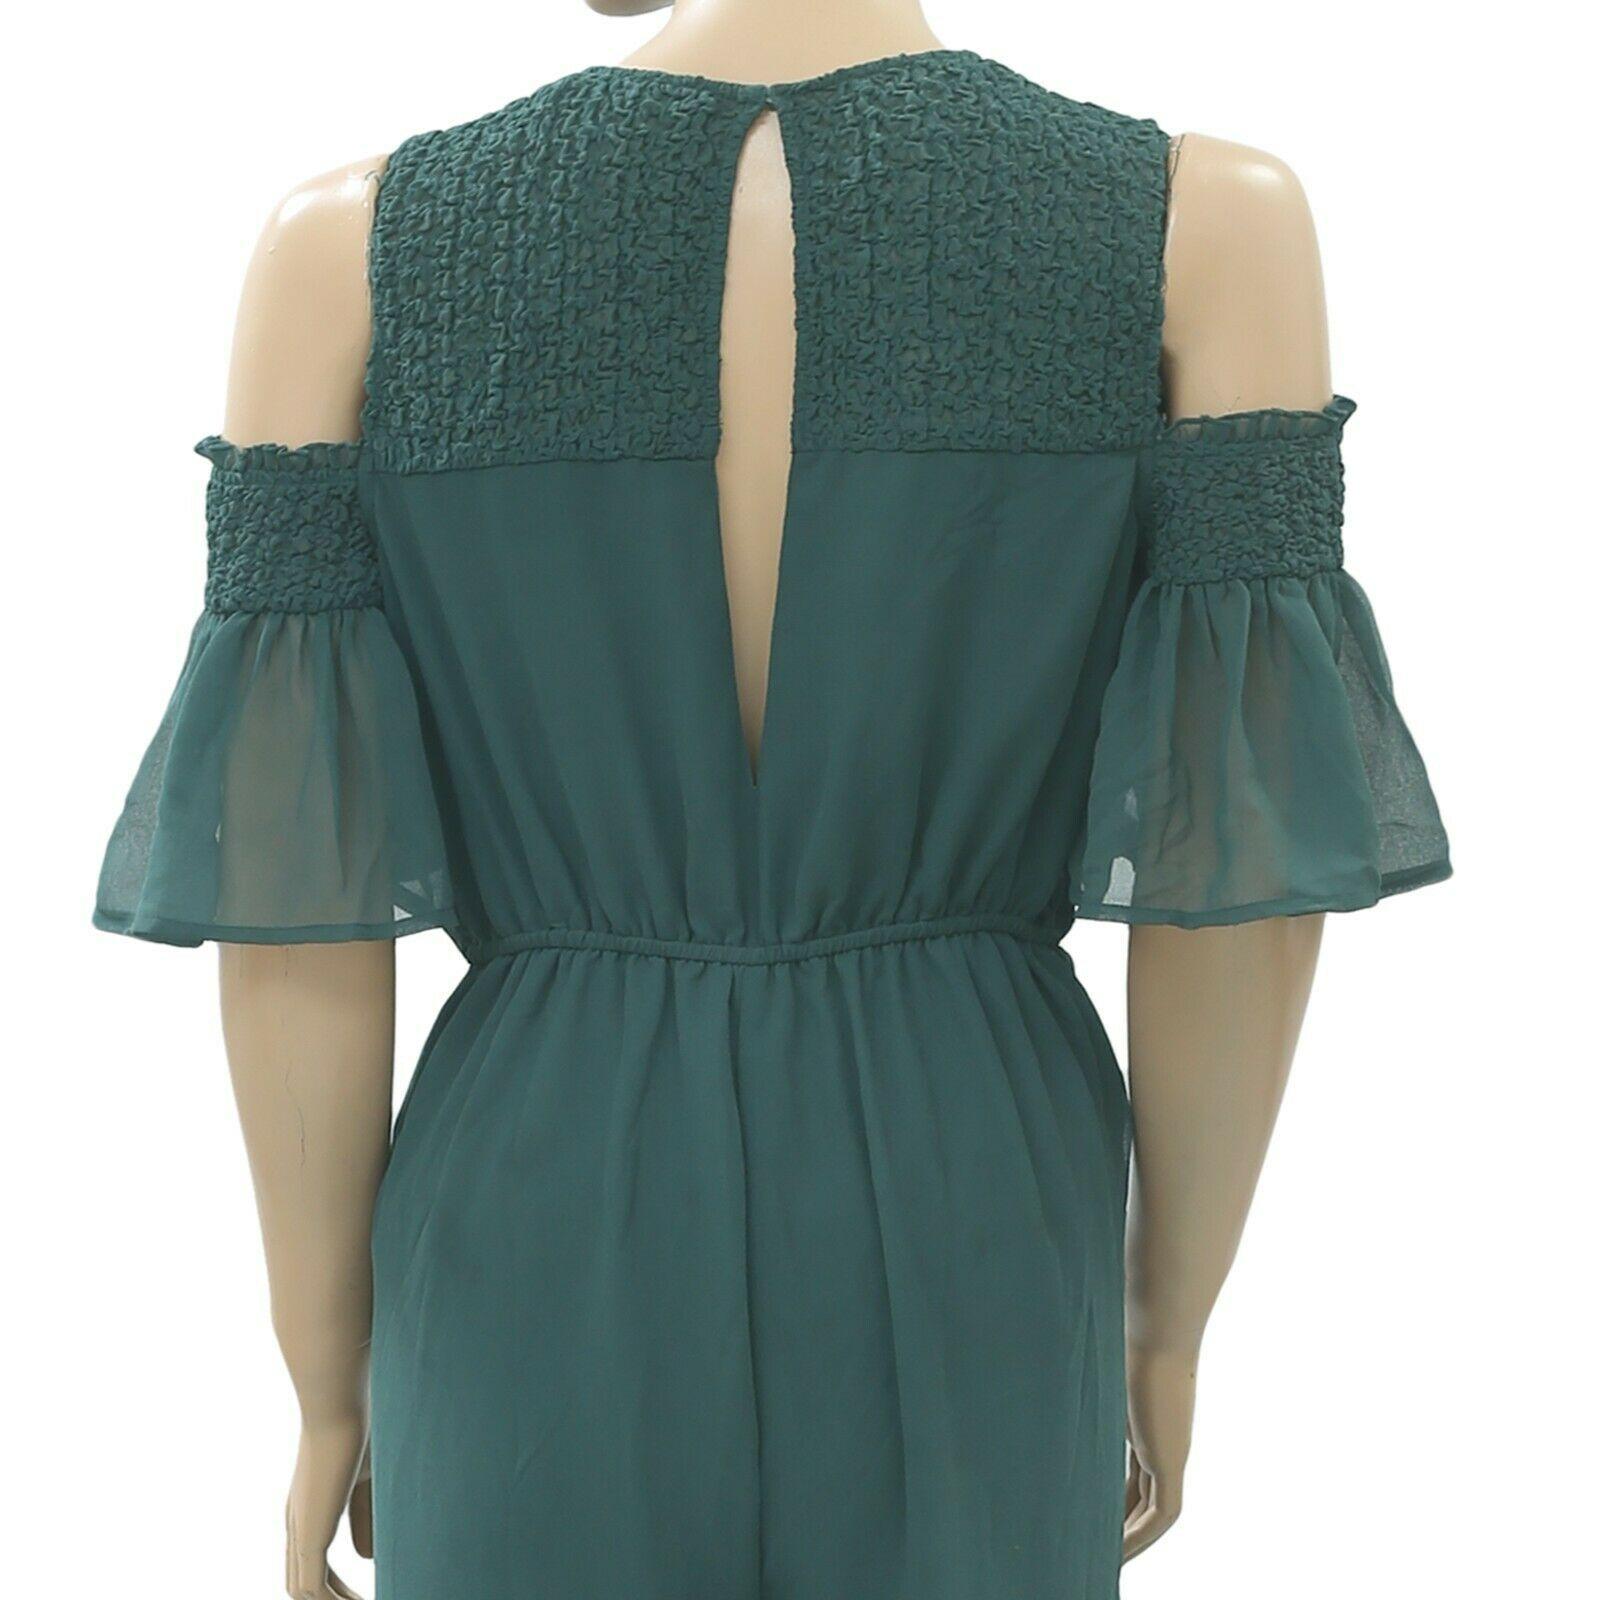 Designer Großartig Abend Dress Zara Bester PreisDesigner Genial Abend Dress Zara für 2019